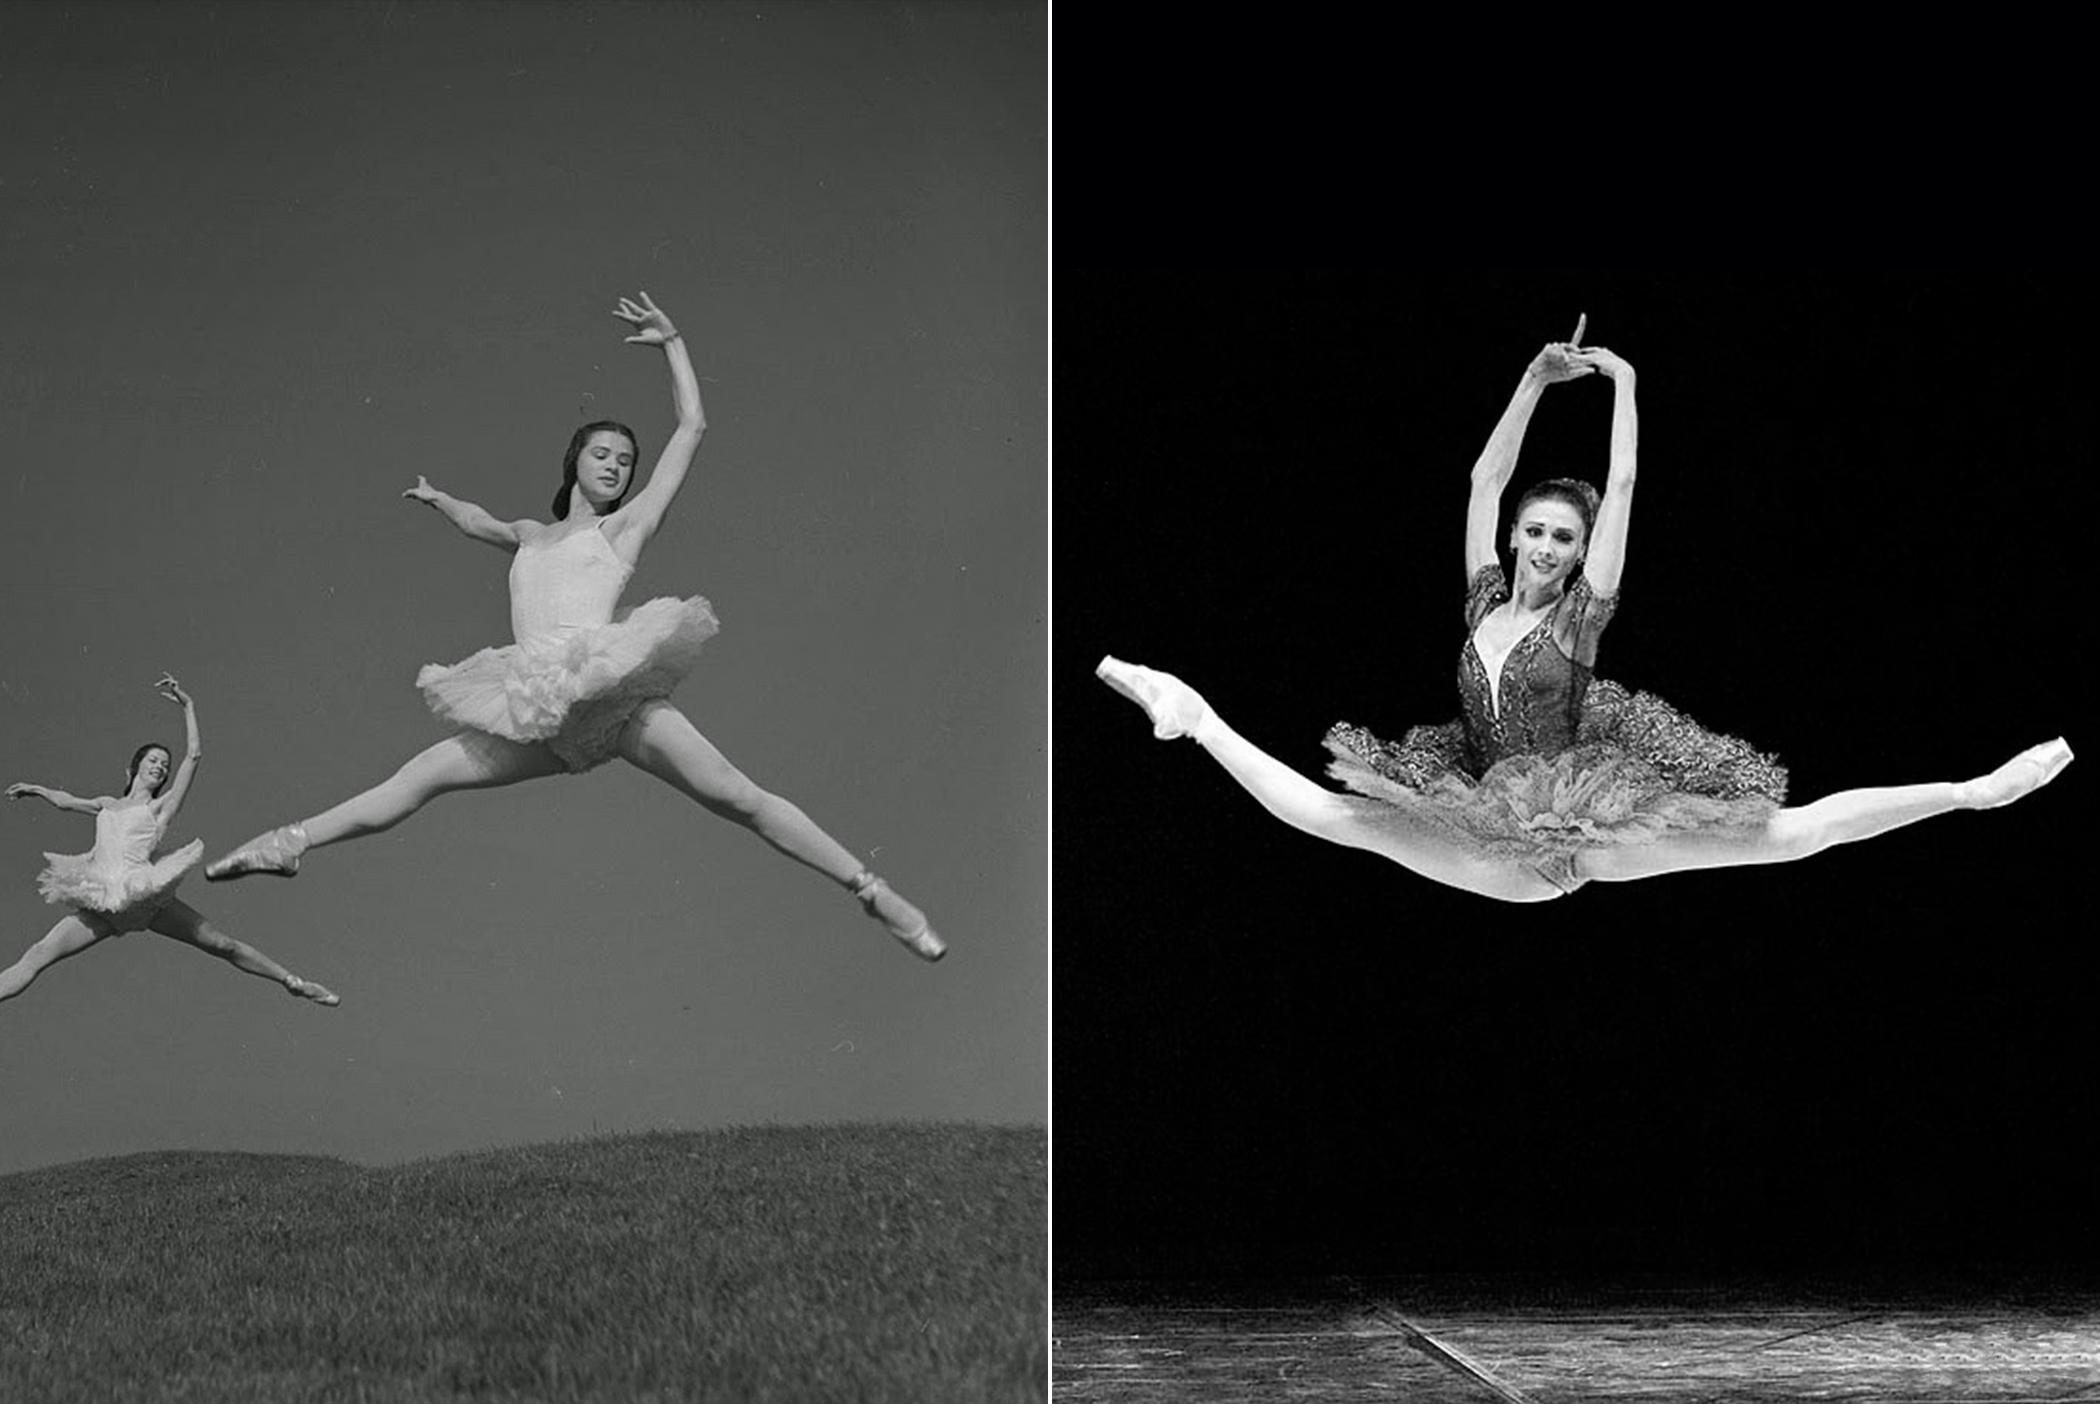 Jetés: Left, two ballerinas from the Boris Volkoff Ballet, Toronto, 1941. Right, Svetlana Zakharova, the modern ballerina